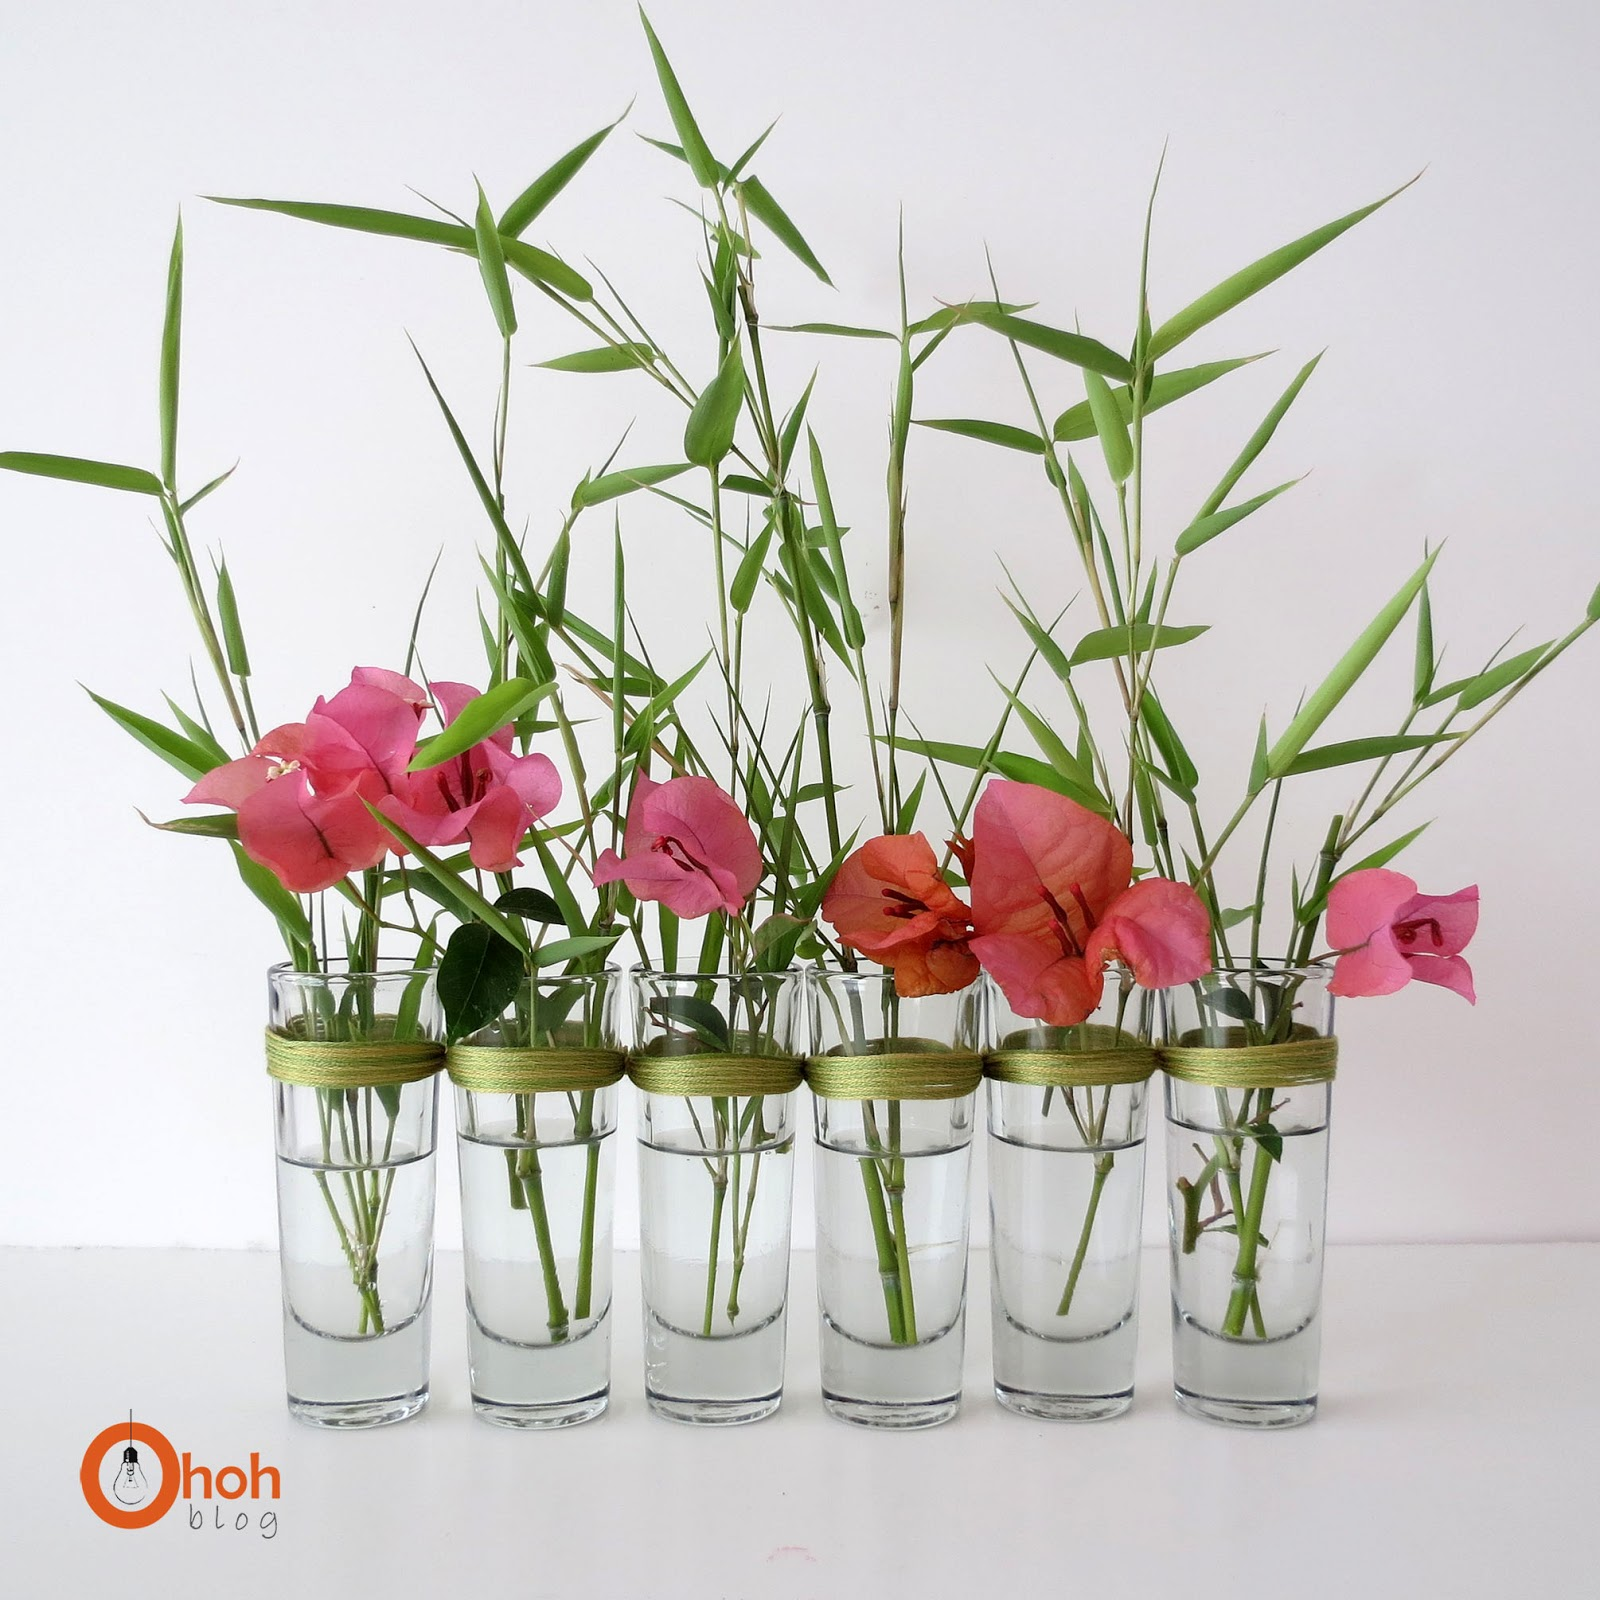 Diy vase ohoh blog Diy home decor flower vase